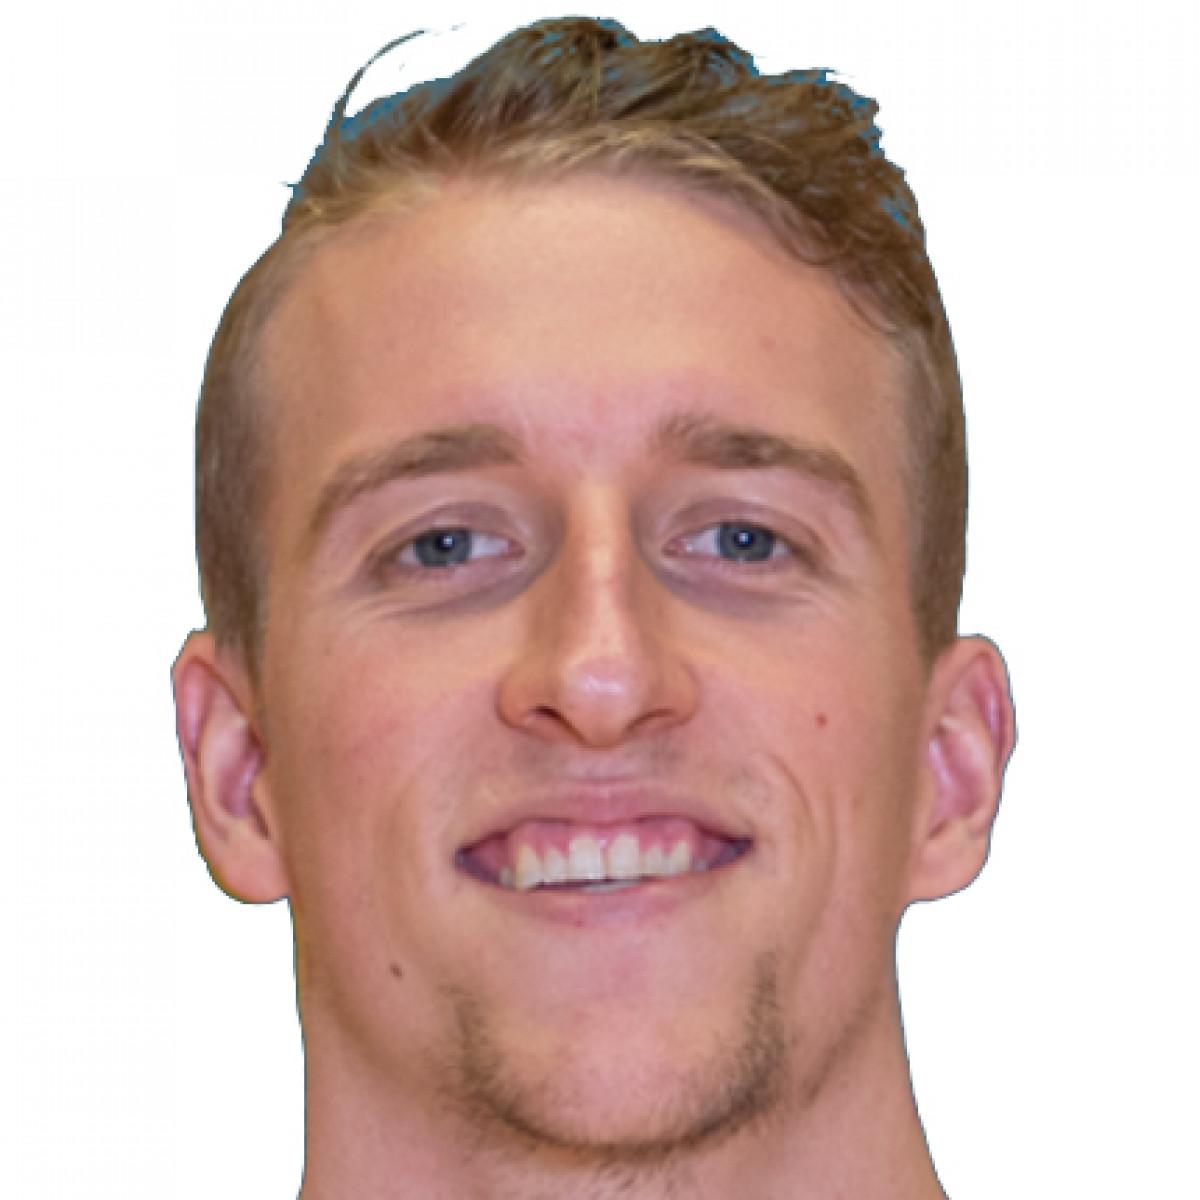 Kevin Bleeker